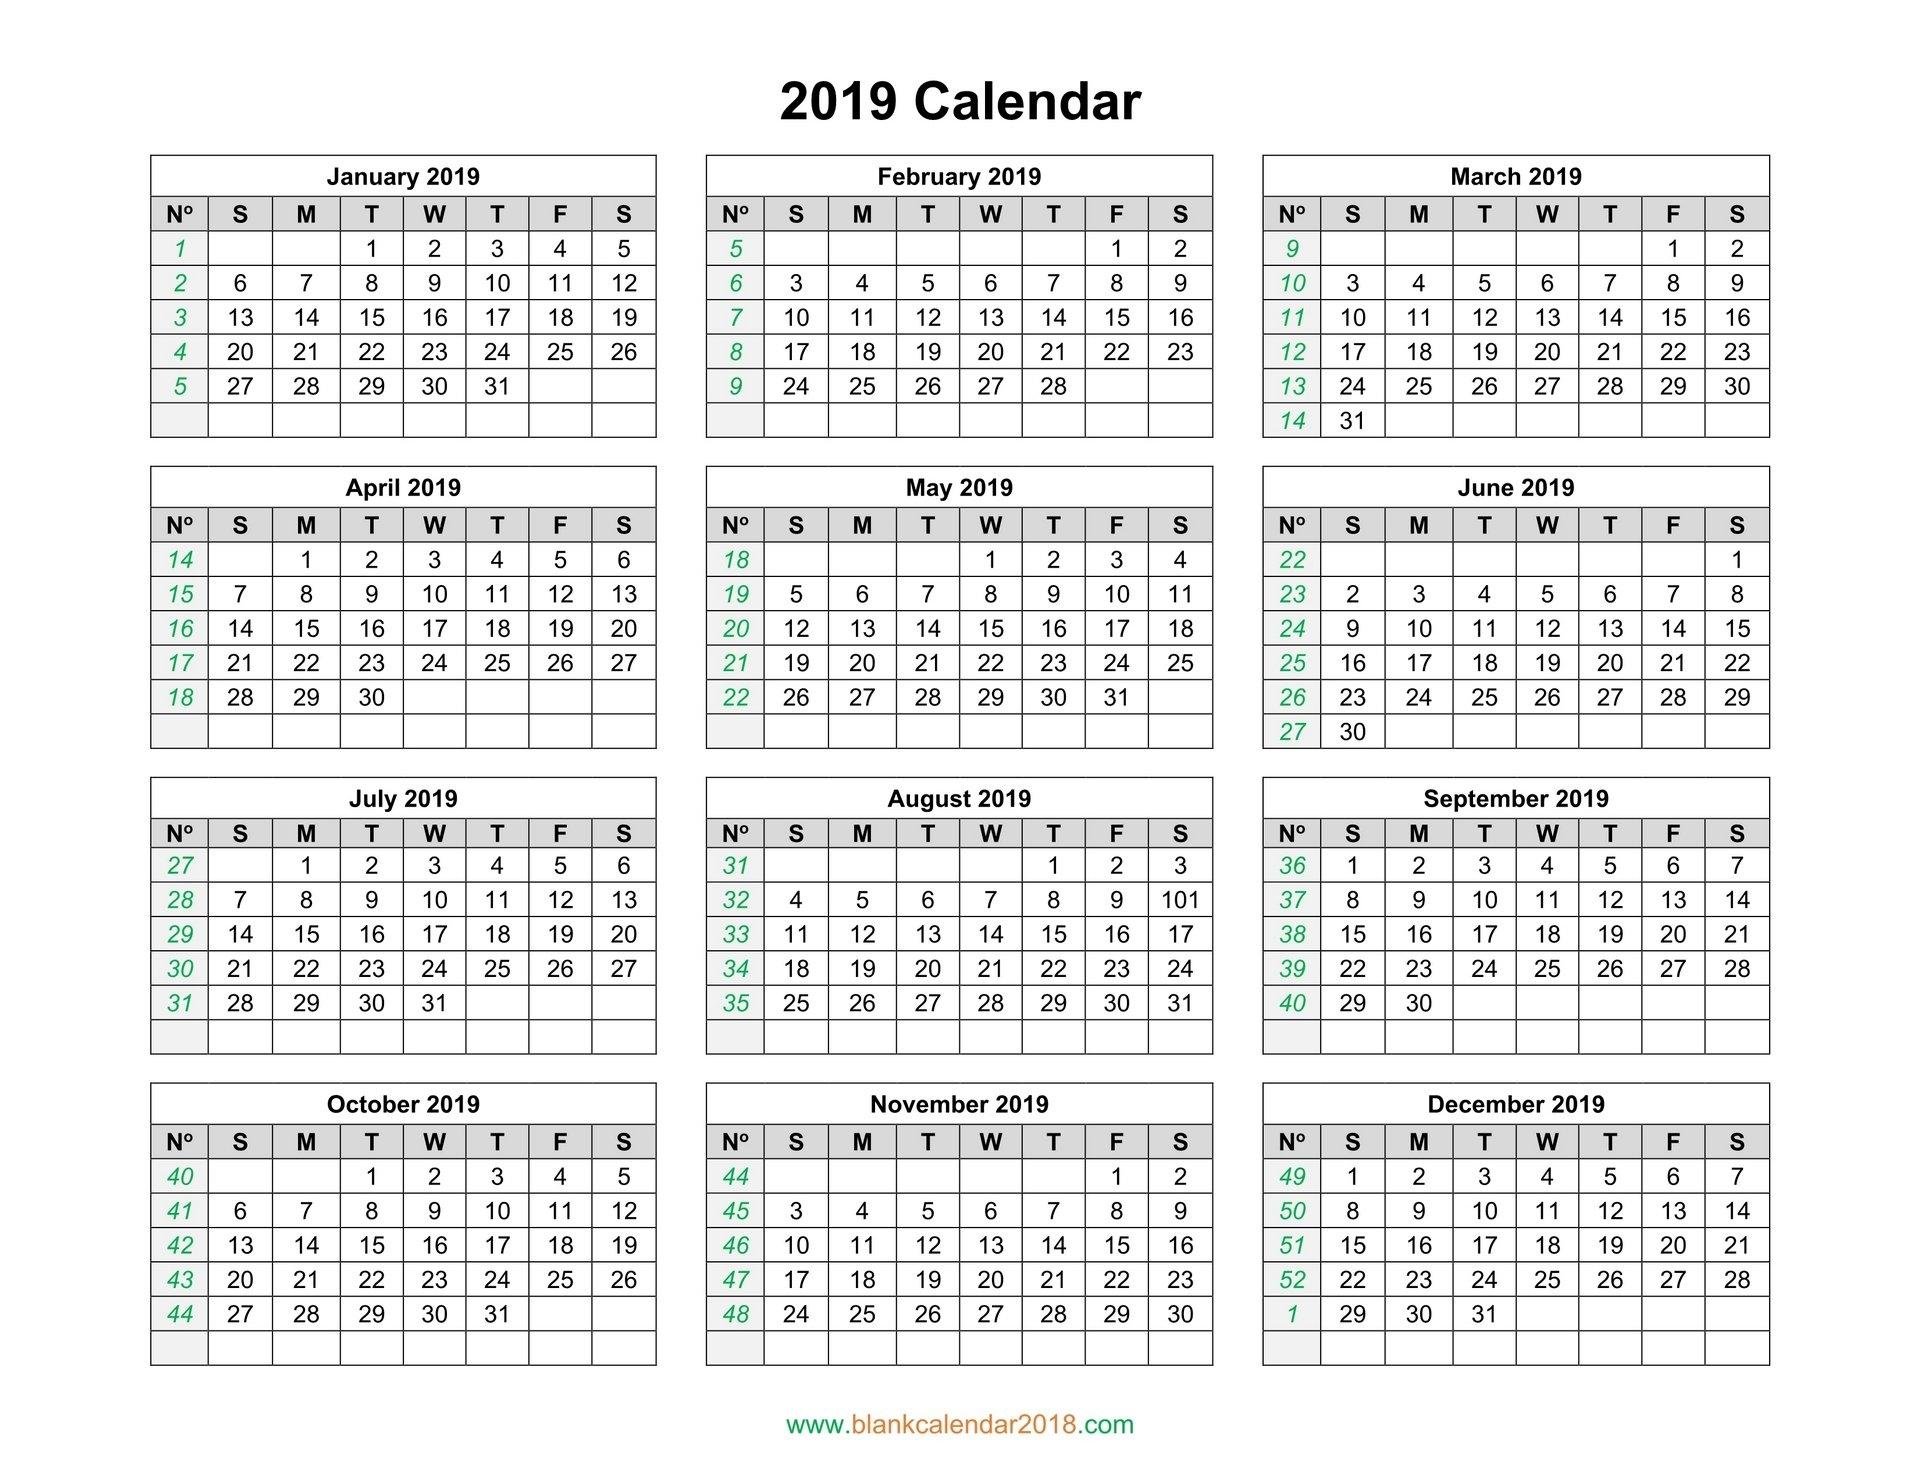 Blank Calendar 2019 Calendar 2019 Yearly Template